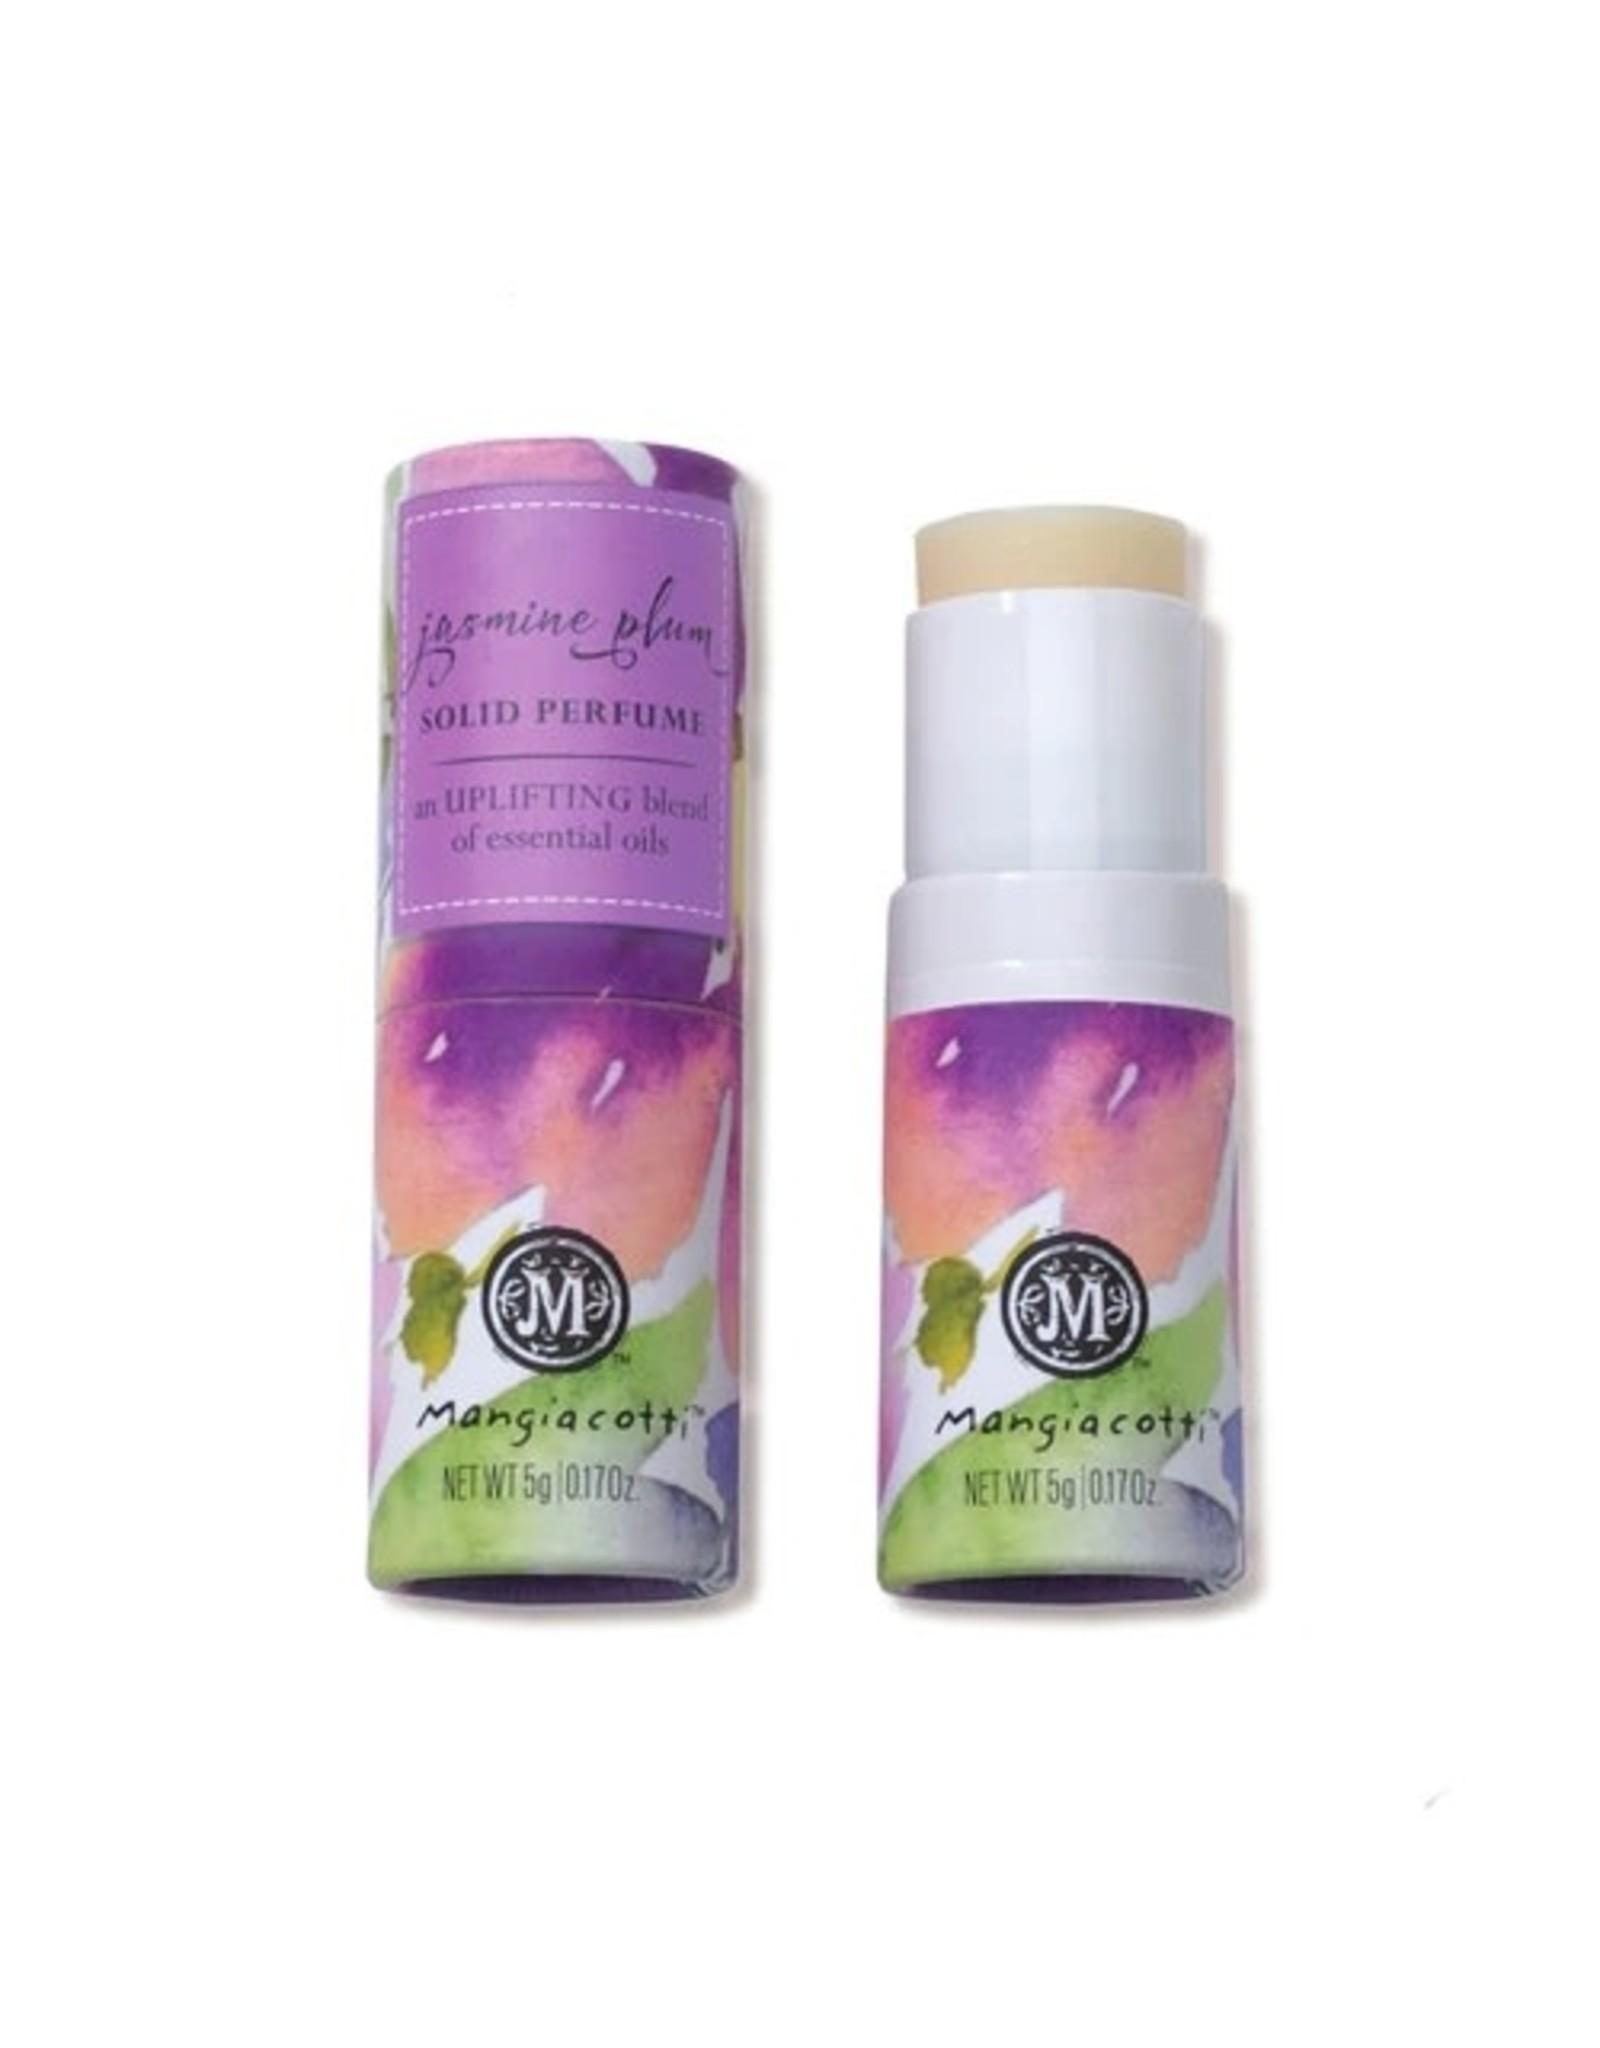 Mangicotti Mangiacotti Solid Perfume Jasmine Plum